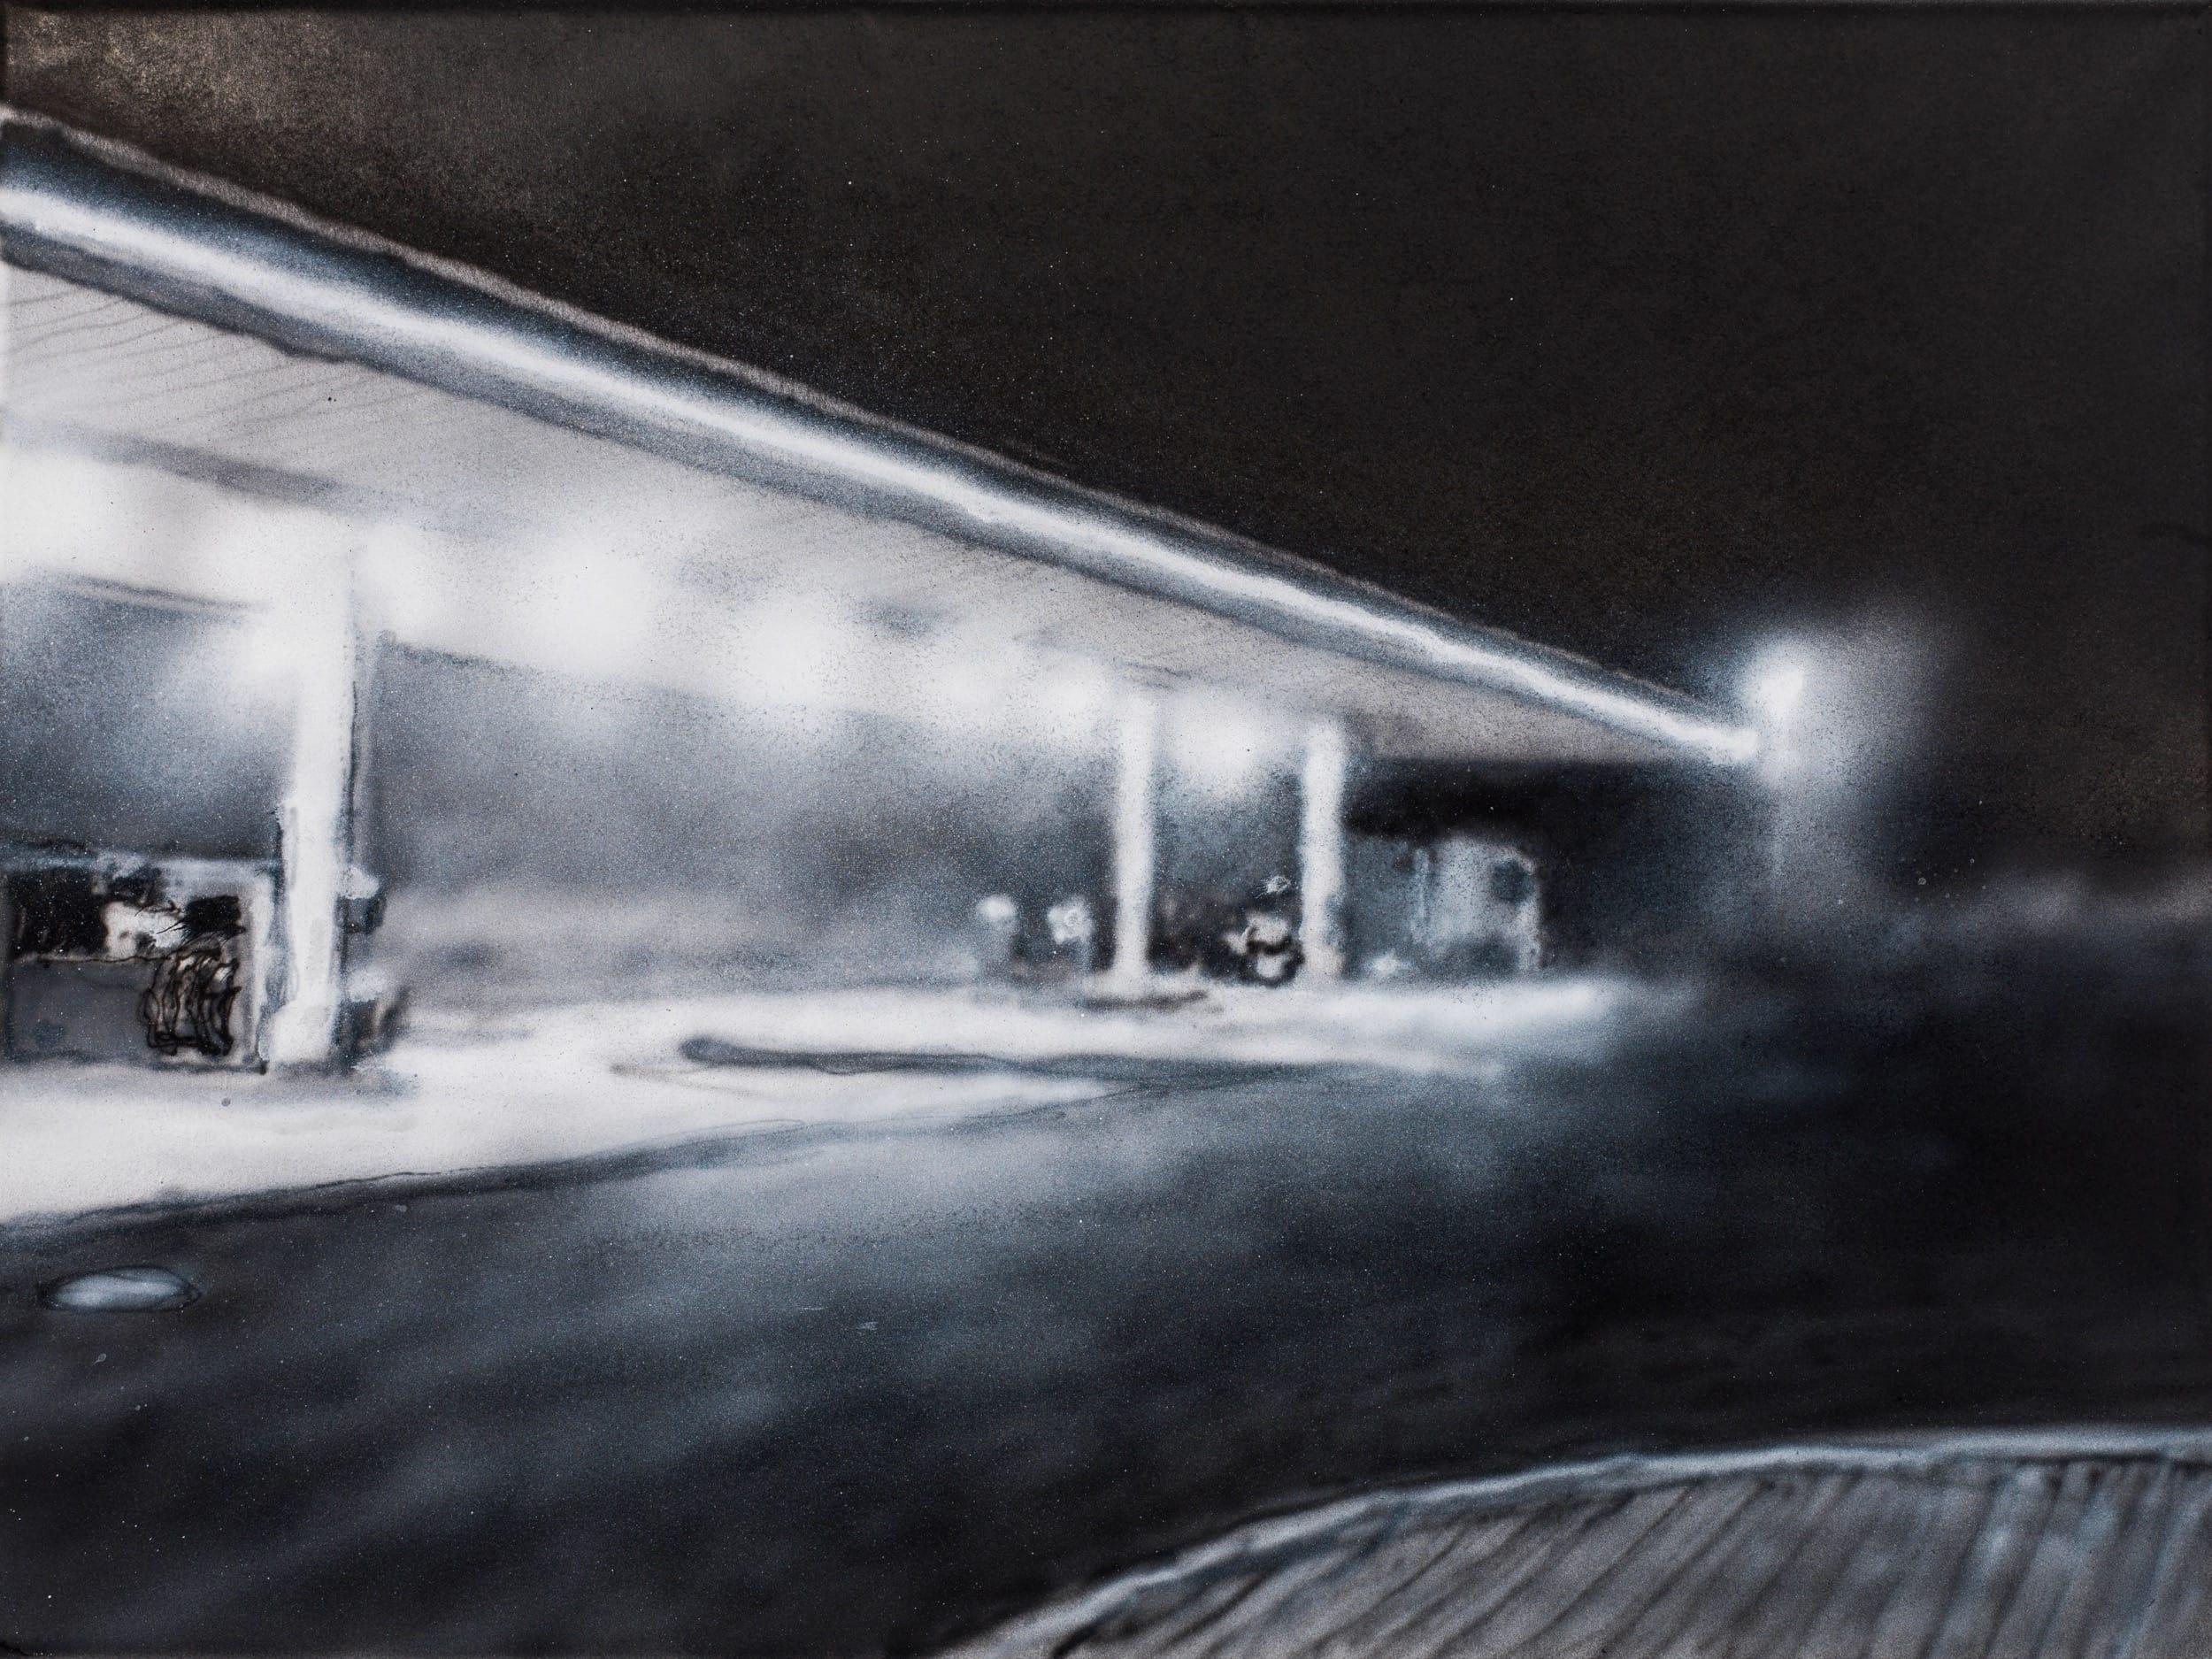 Tankstelle, Magdeburg. Ink on paper, 40 x 30 cm, 2019